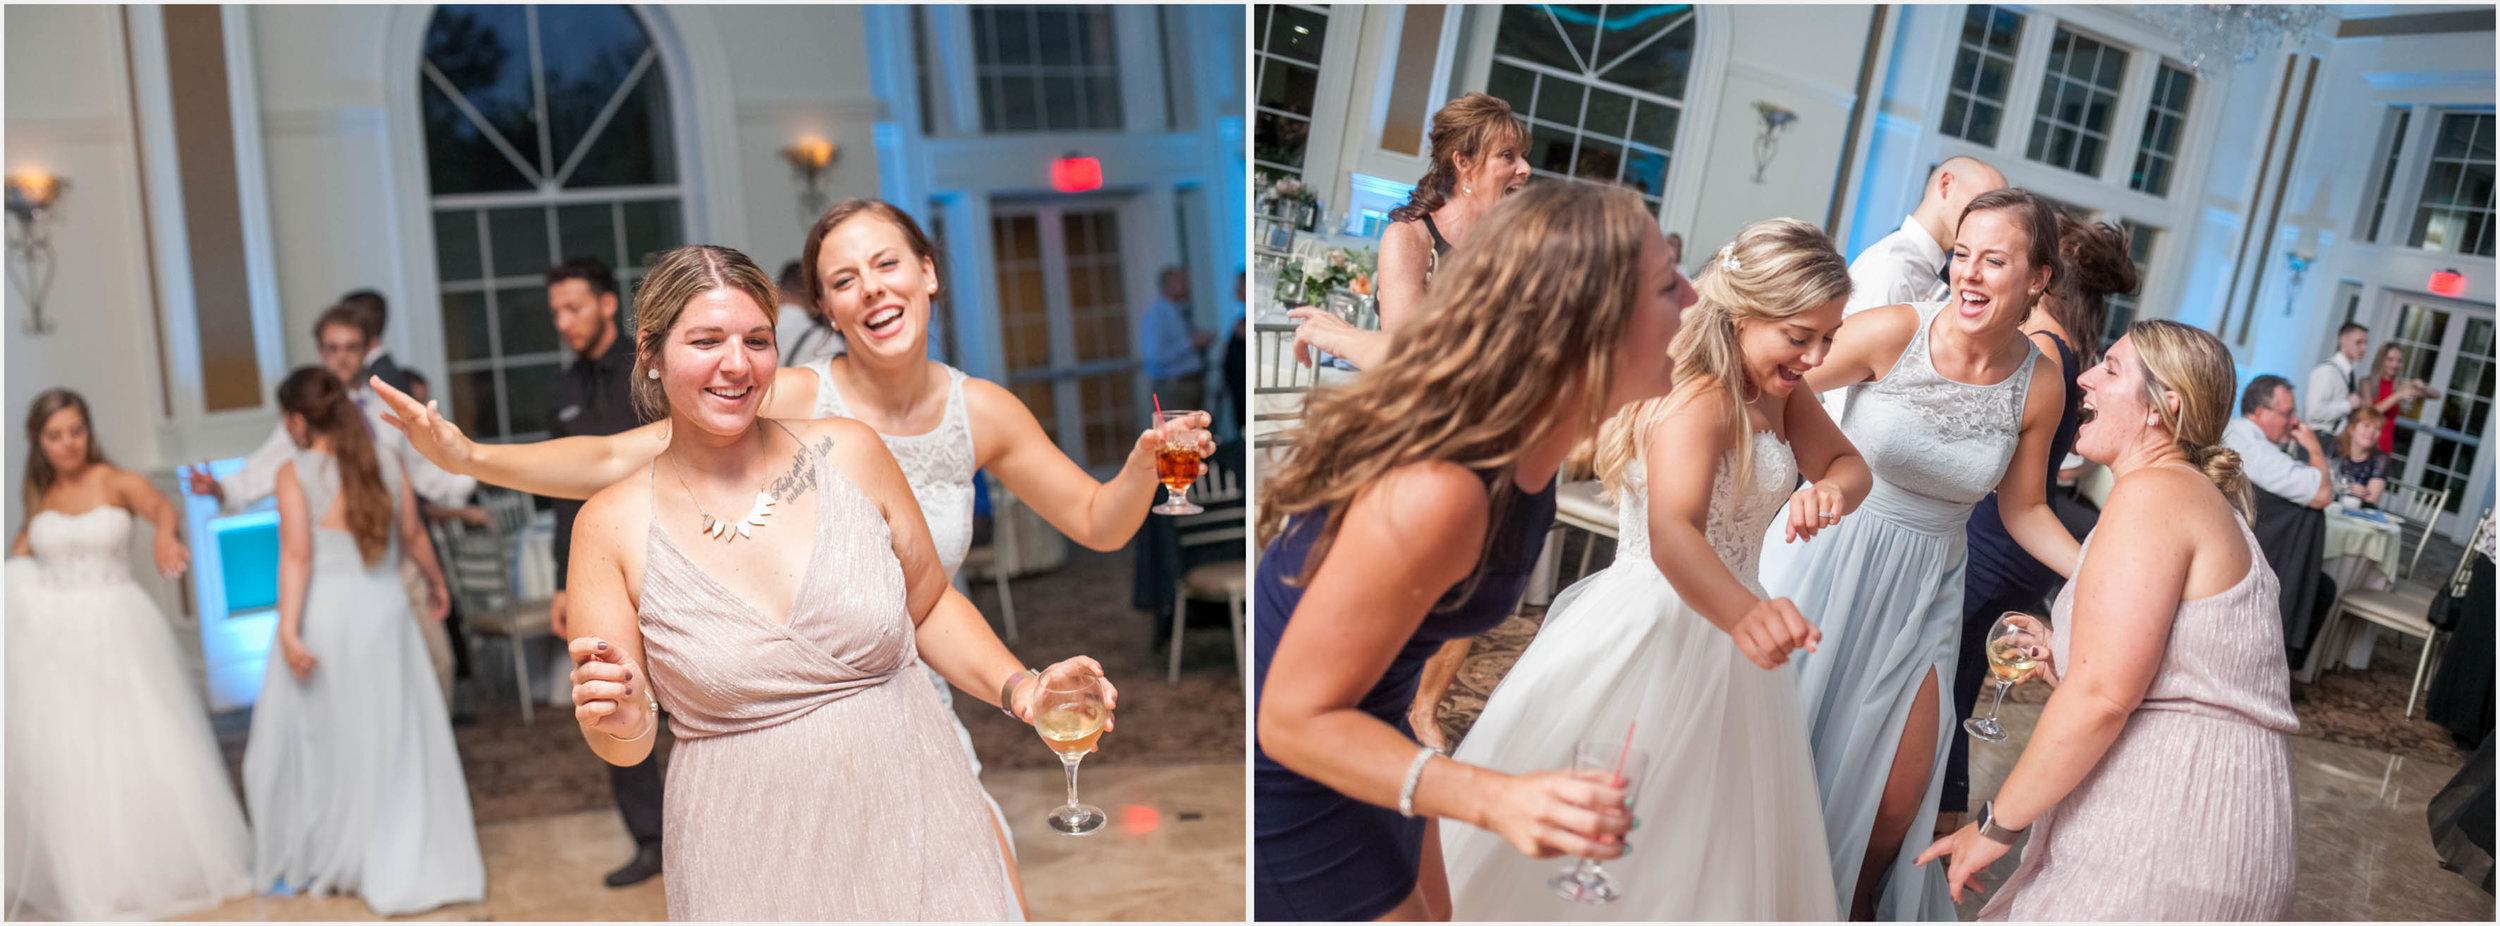 Cassondre Mae Photography Hudson Valley NY Wedding Photographer -34.jpg